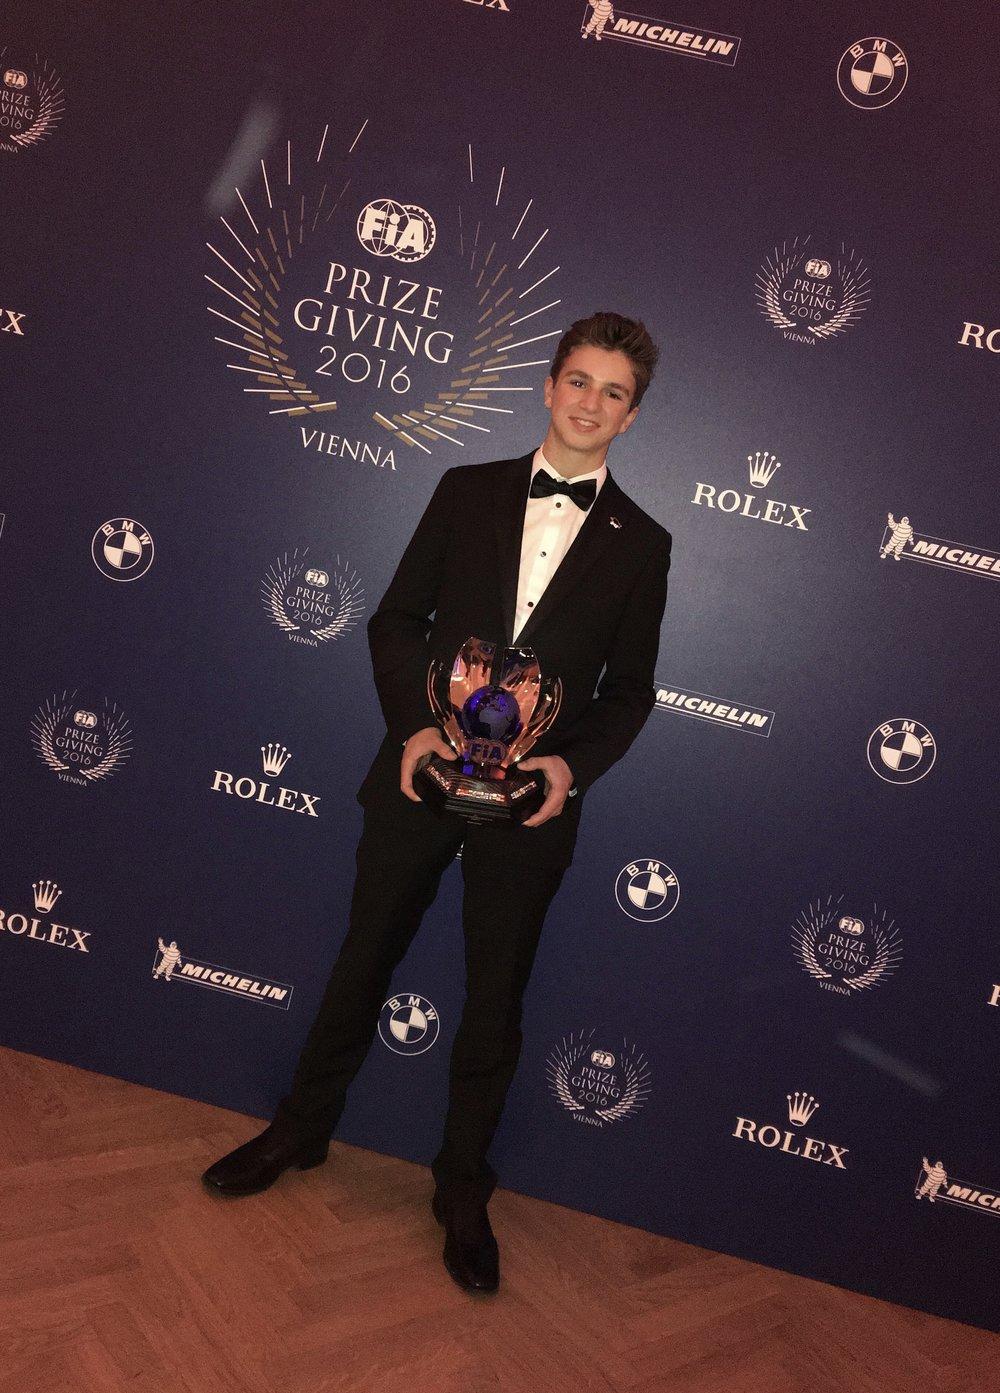 Bruno Carneiro FIA 2016 Prize Giving Gala